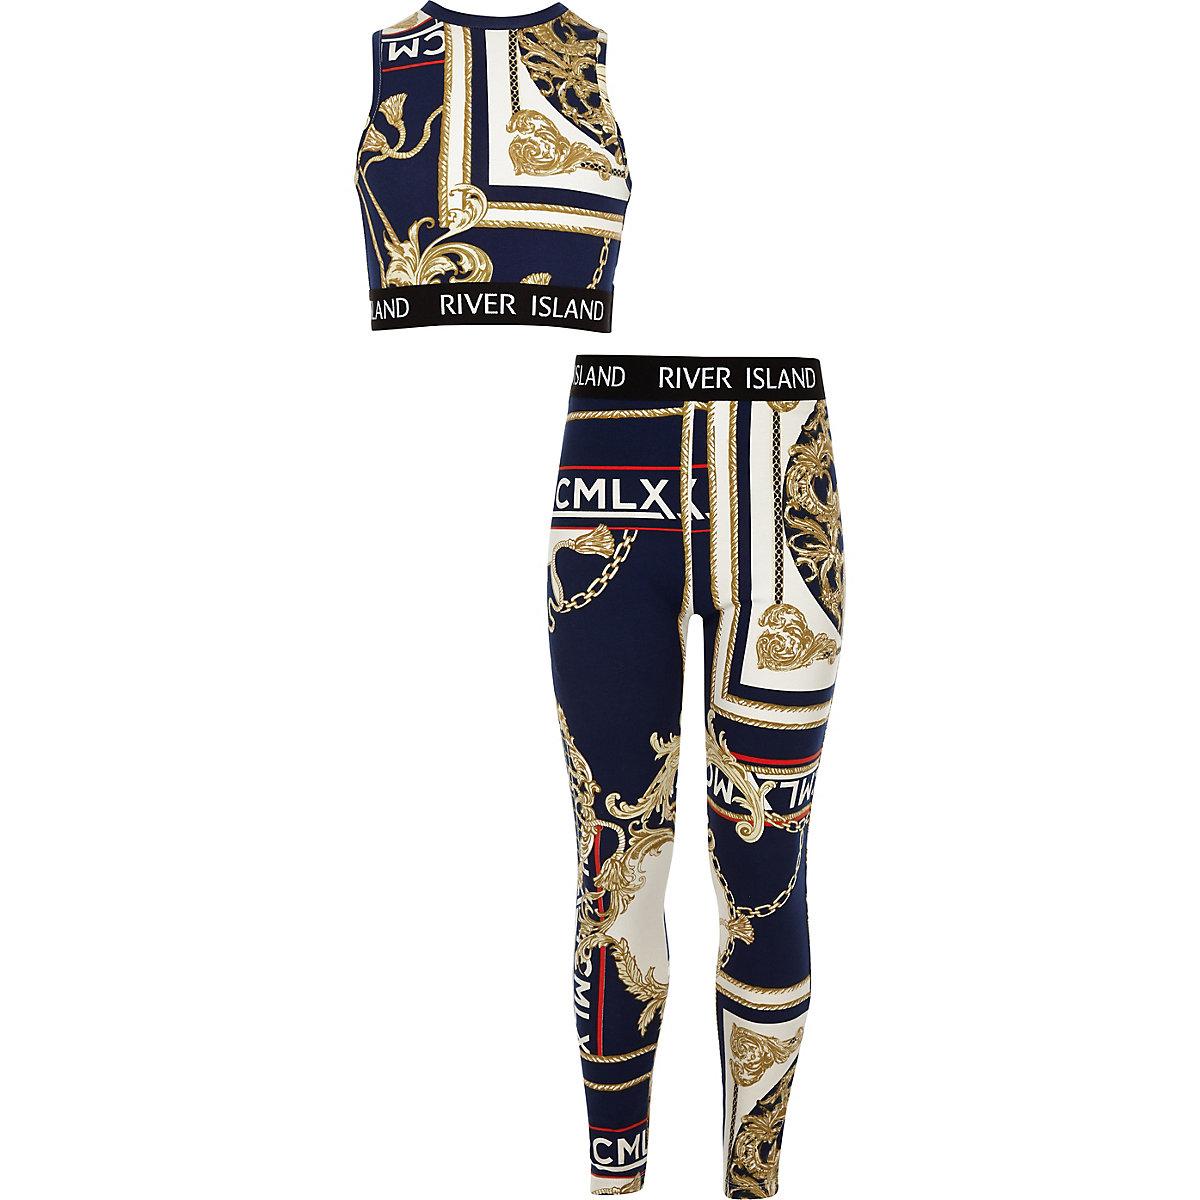 Girls navy baroque crop top outfit